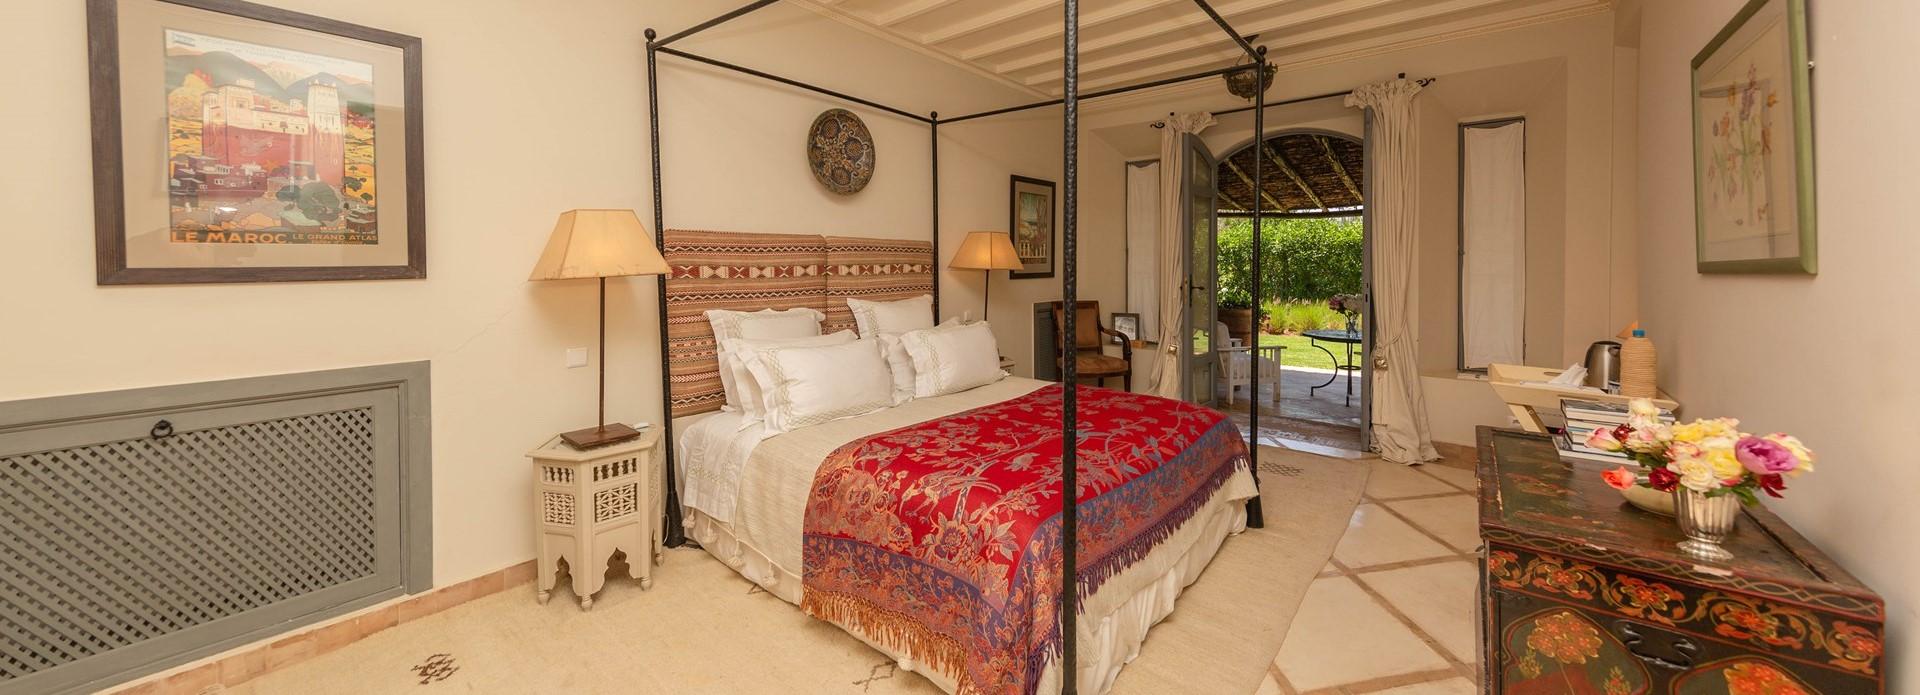 villa-dar-tourtite-double-bedroom-1